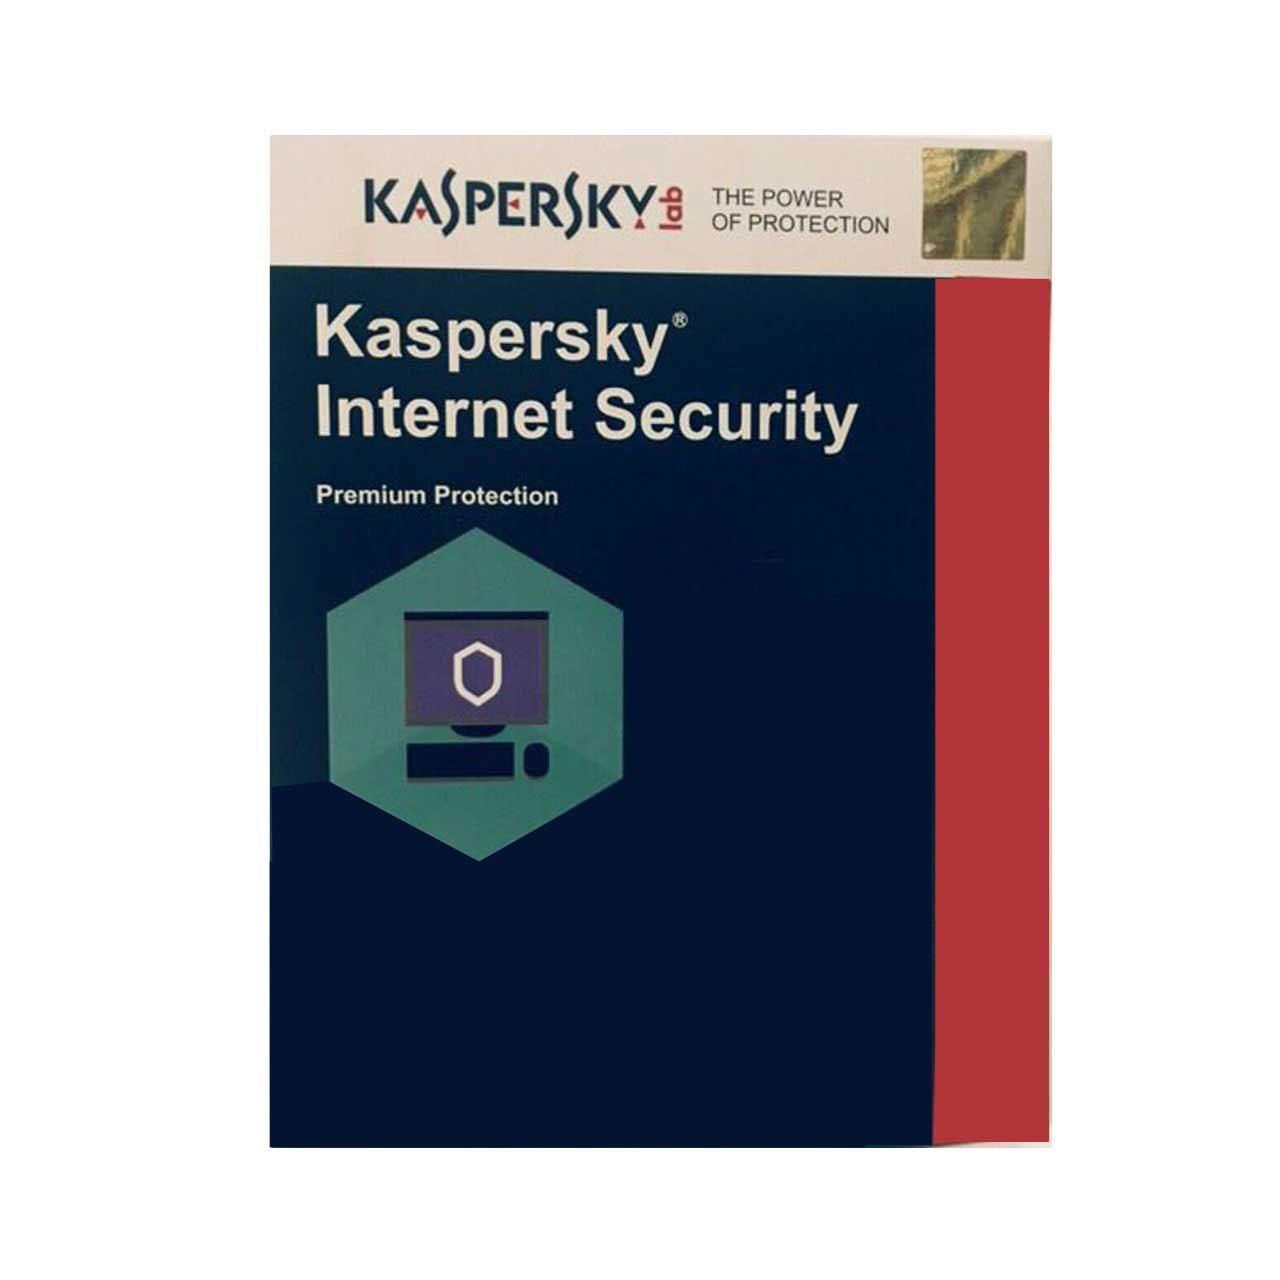 نرم افزار کسپراسکی اینترنت سکوریتی 2017